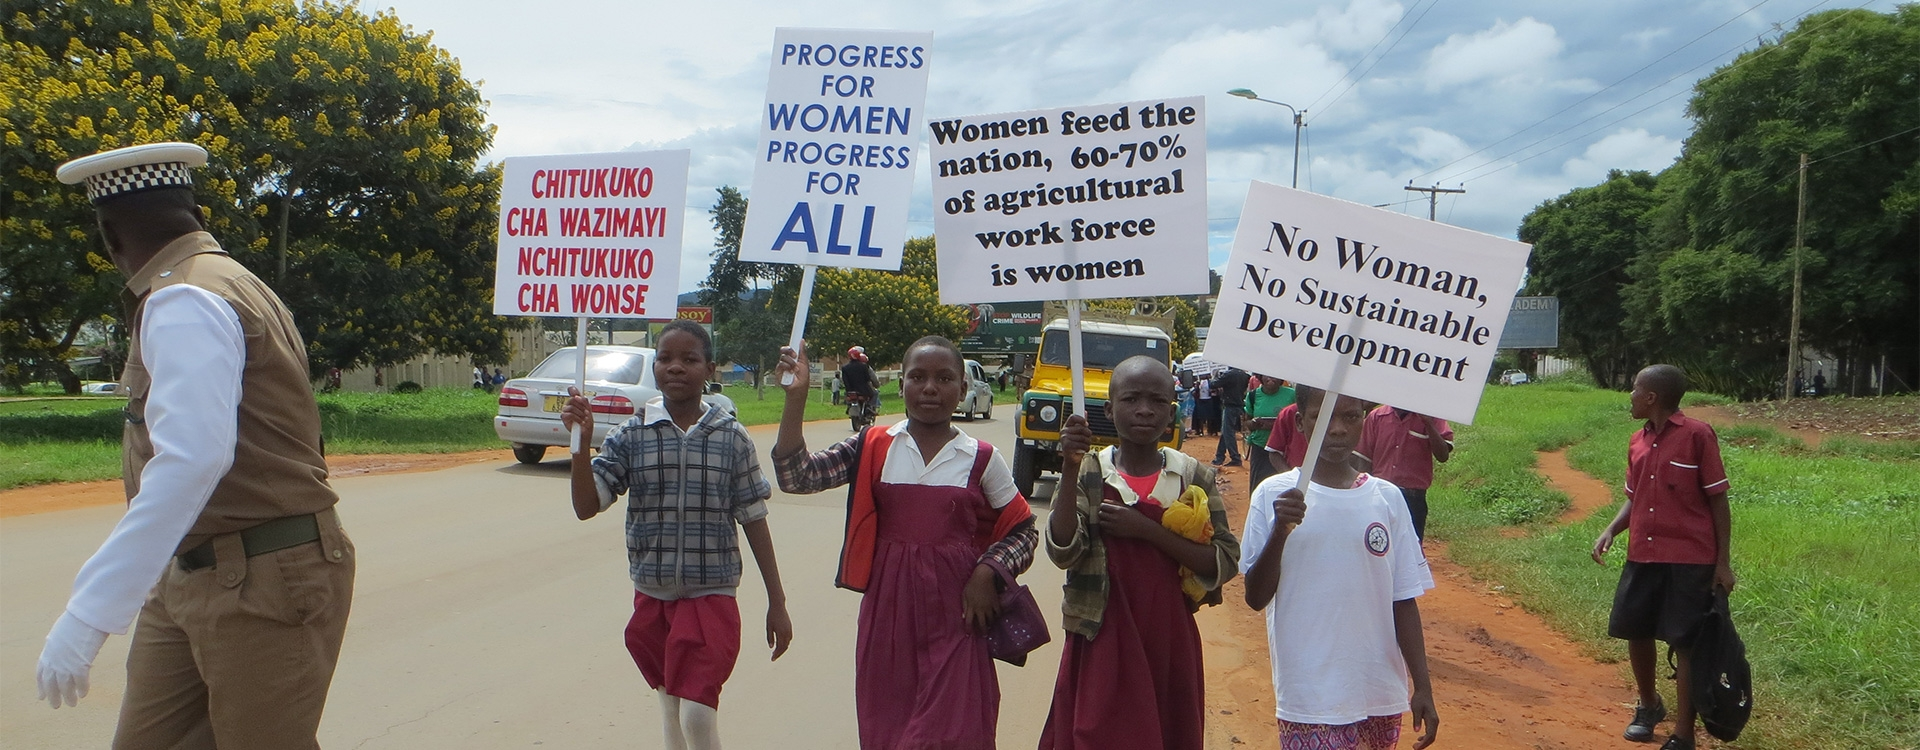 March 8 – International Women's Day (B2)